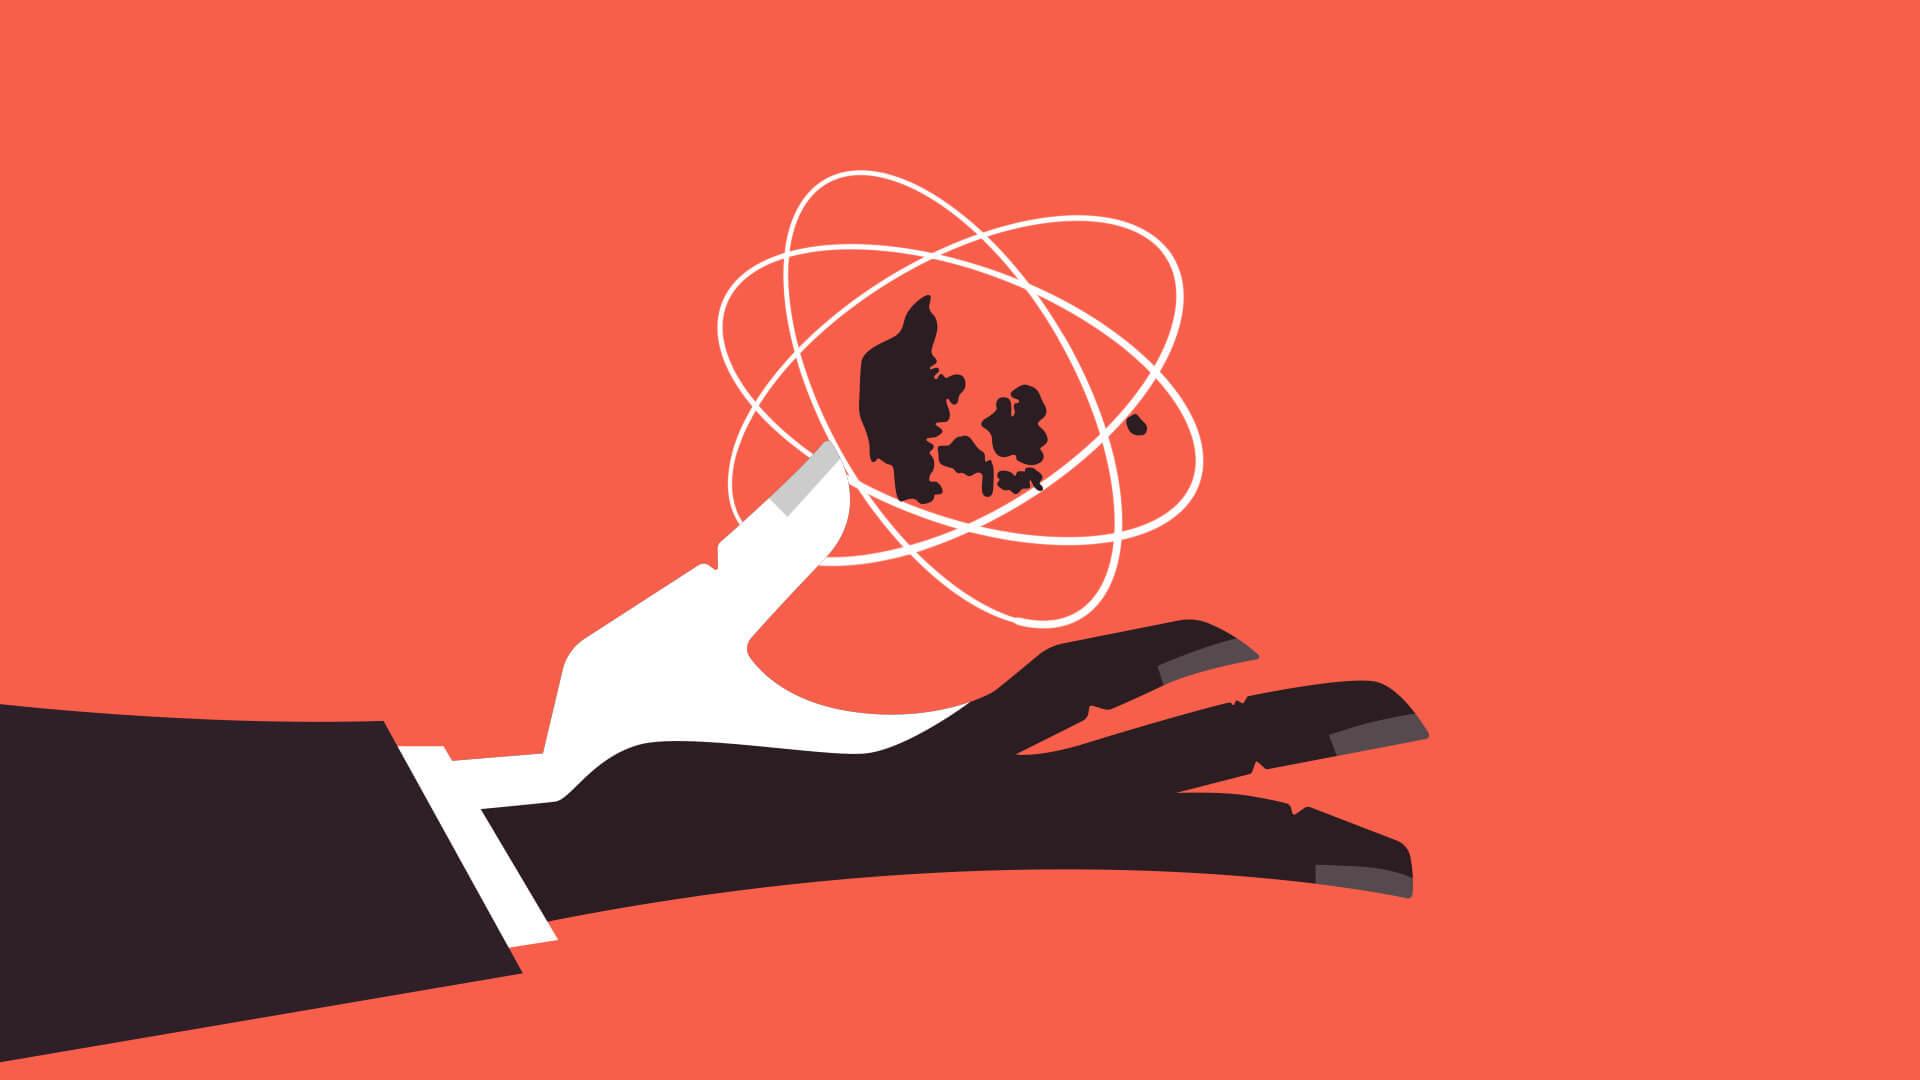 atomkraft-thumb.jpg